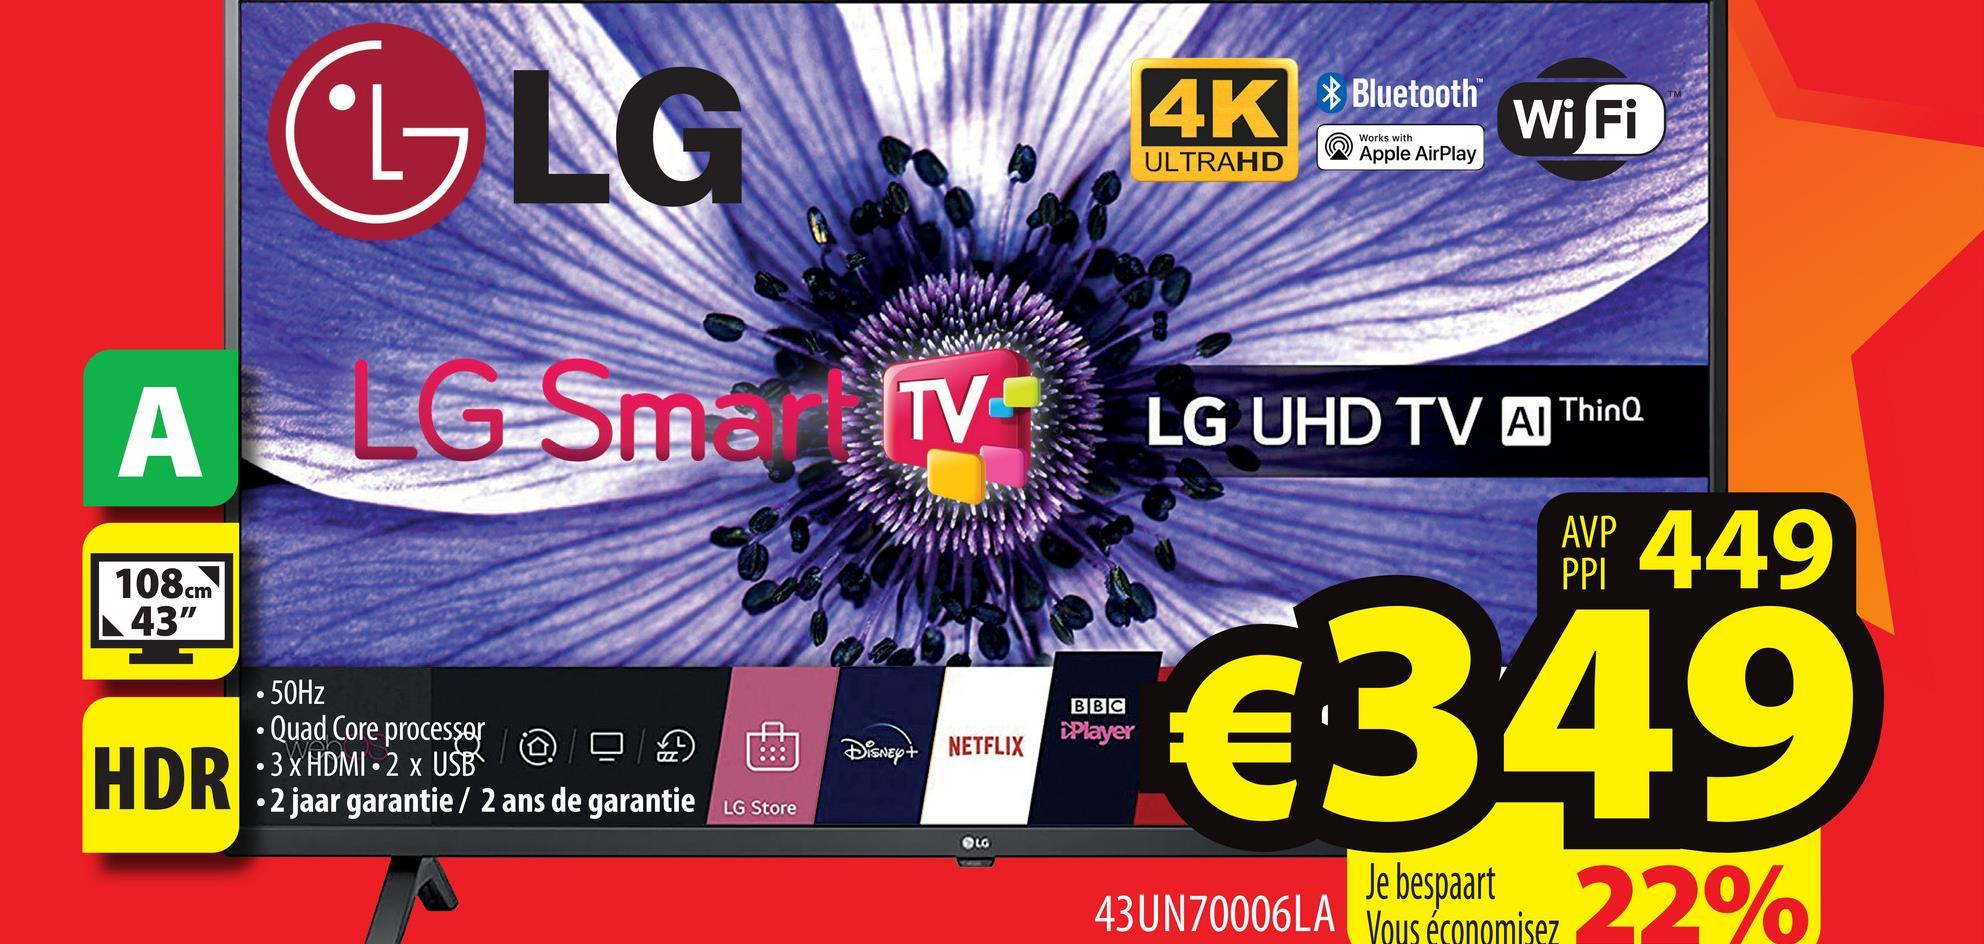 "WiFi 4K Bluetooth Works with CGLG ULTRAHD Apple AirPlay ALG Sms TV TV LG UHD TV Al Thing AVP 449 108cm 43"" BBC Player • 50Hz . Quad Core processor • 3 x HDMI: 2 x USB • 2 jaar garantie / 2 ans de garantie LG Store DISNEY+ NETFLIX HDR =3XHDMI-2 x USB LG 43UN70006LA de les paremisez 22%"